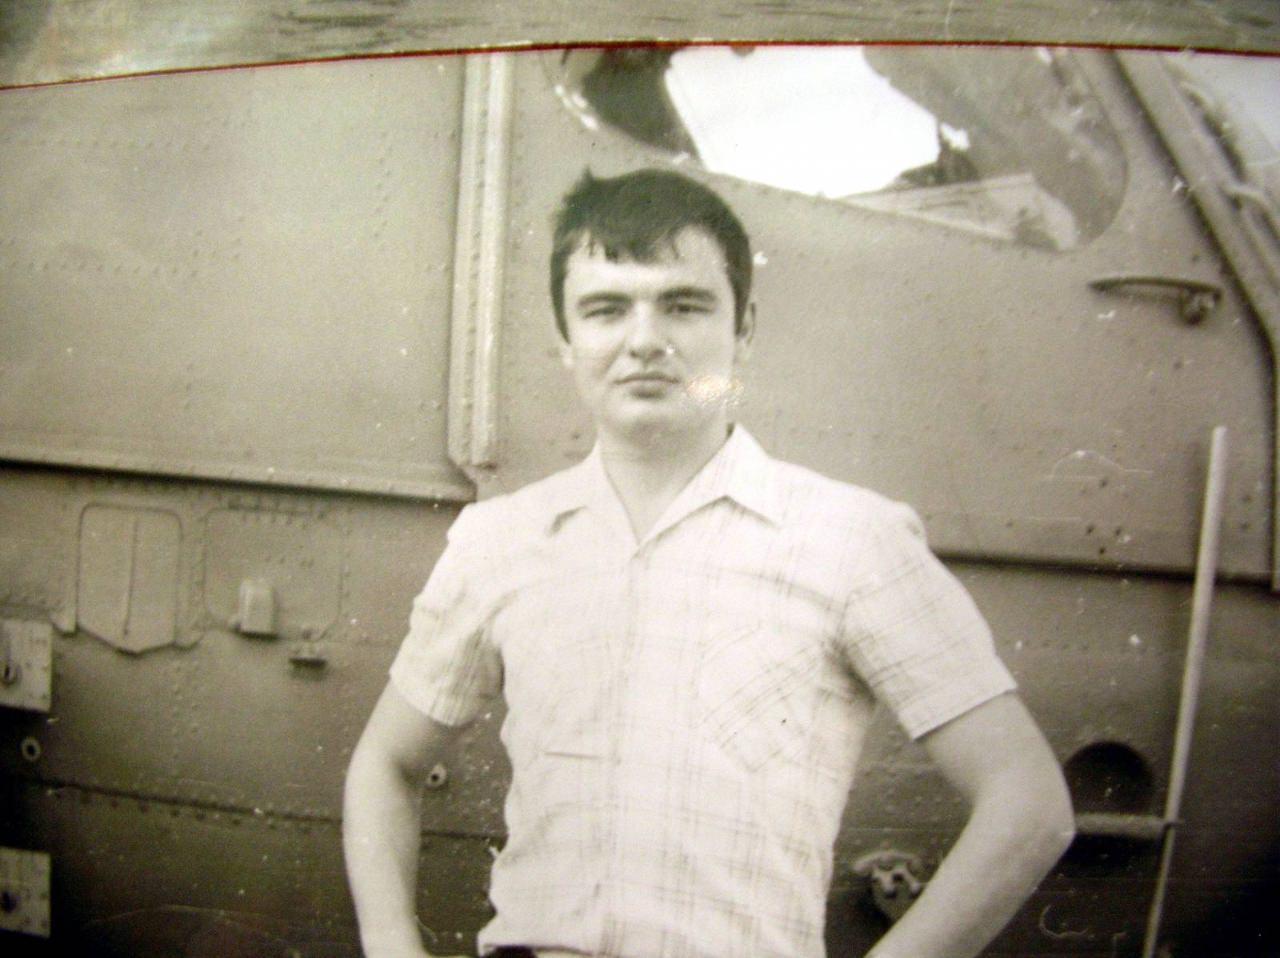 Лето 1984. Лакин Олег на фоне вертолета с противолодочного крейсера (ПКР) [вертолетоносца] «Ленинград»